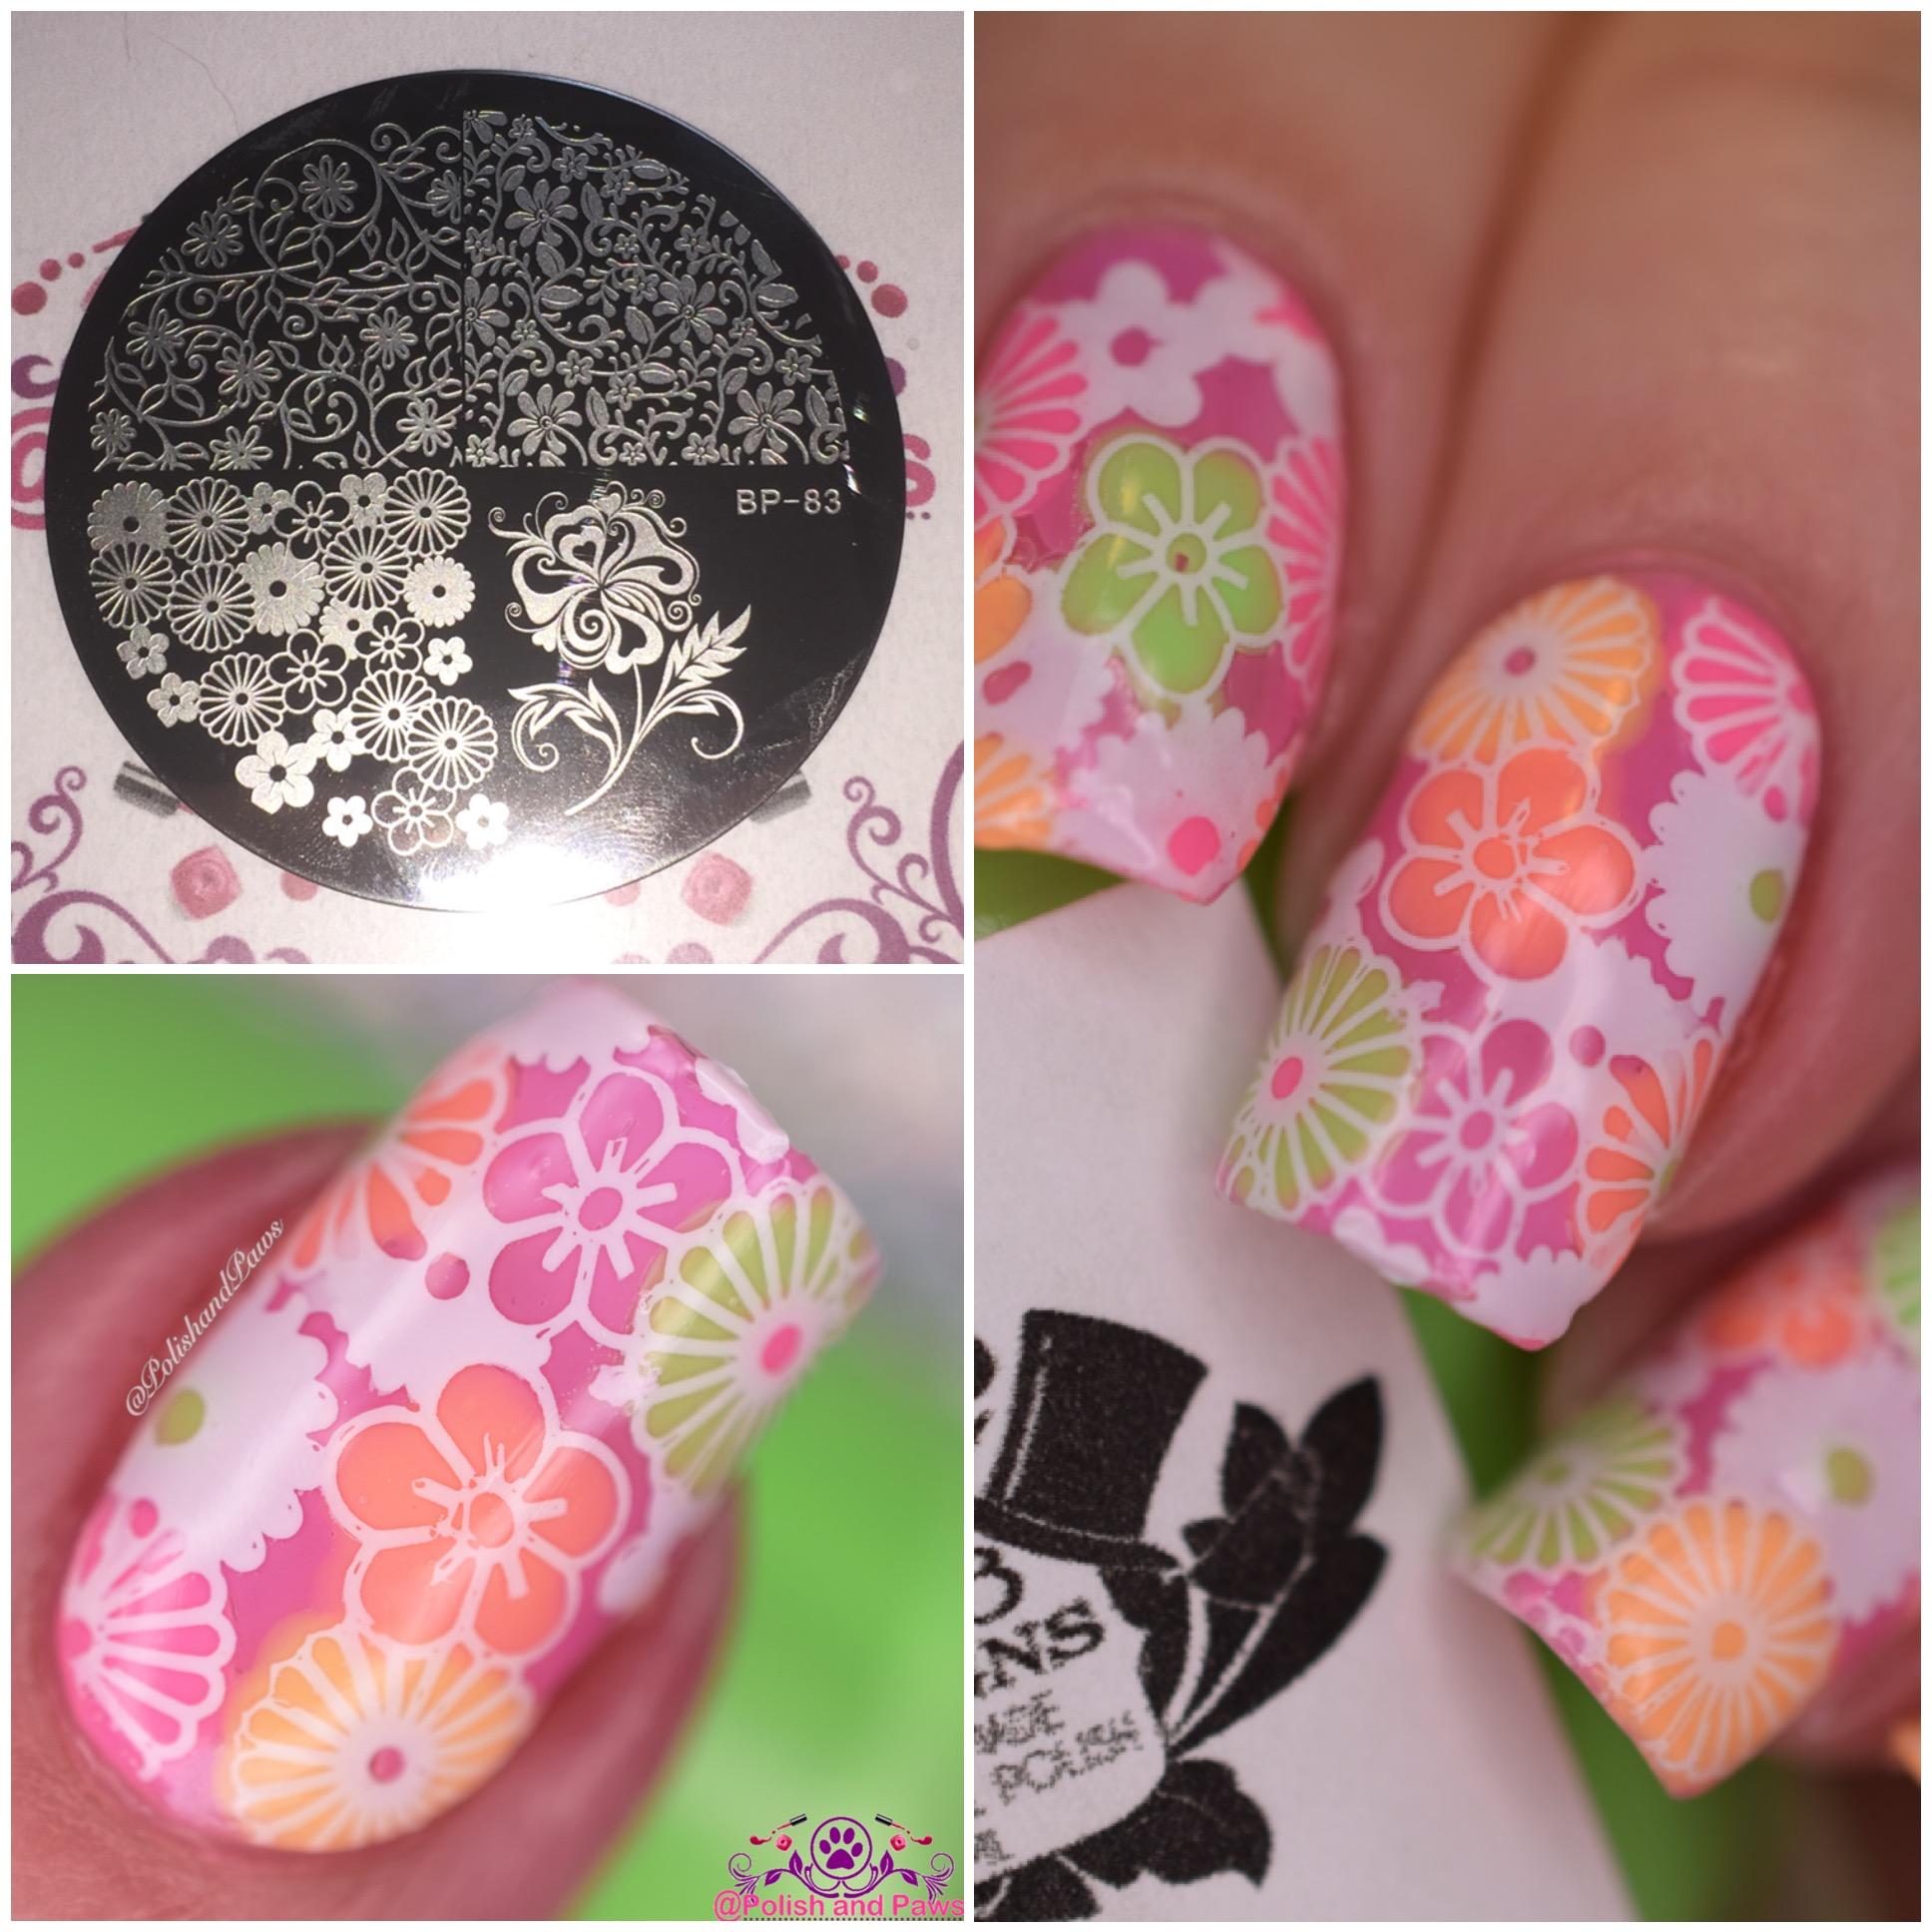 Geometric Reverse Stamping Nail Art Born Pretty Review: Nail Art ~ Born Pretty Store BP-83